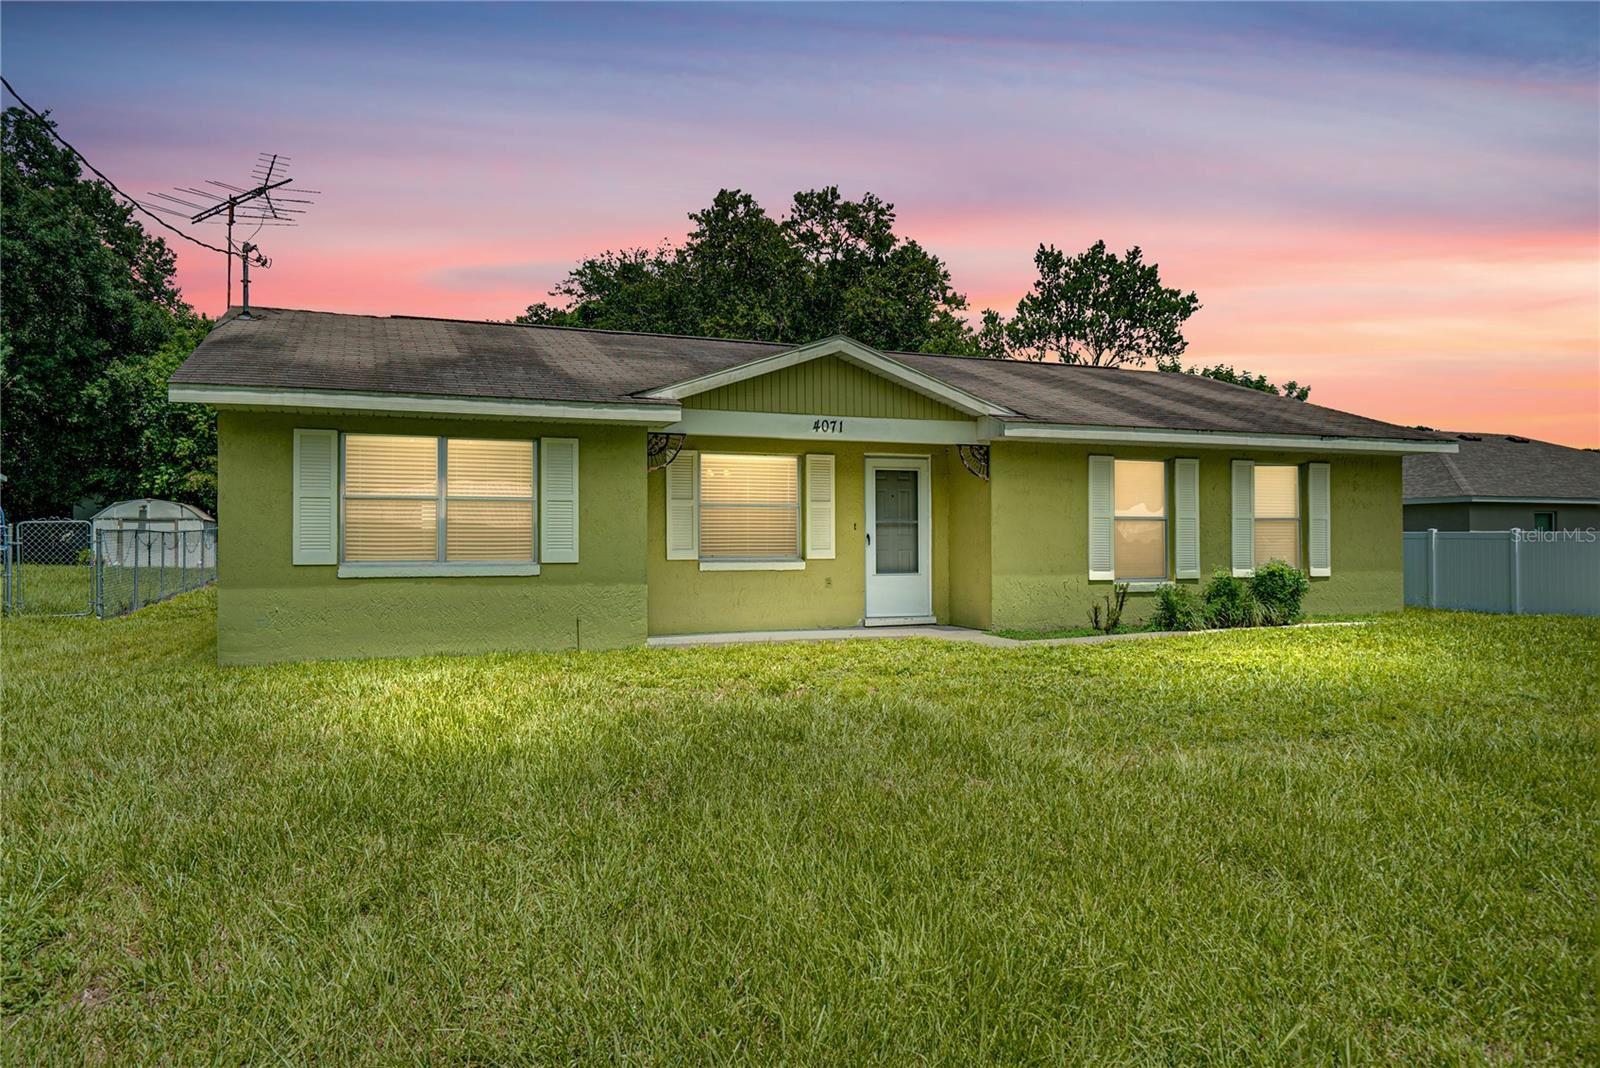 4071 2ND STREET NW, Lakeland, FL 33810 - #: L4924176